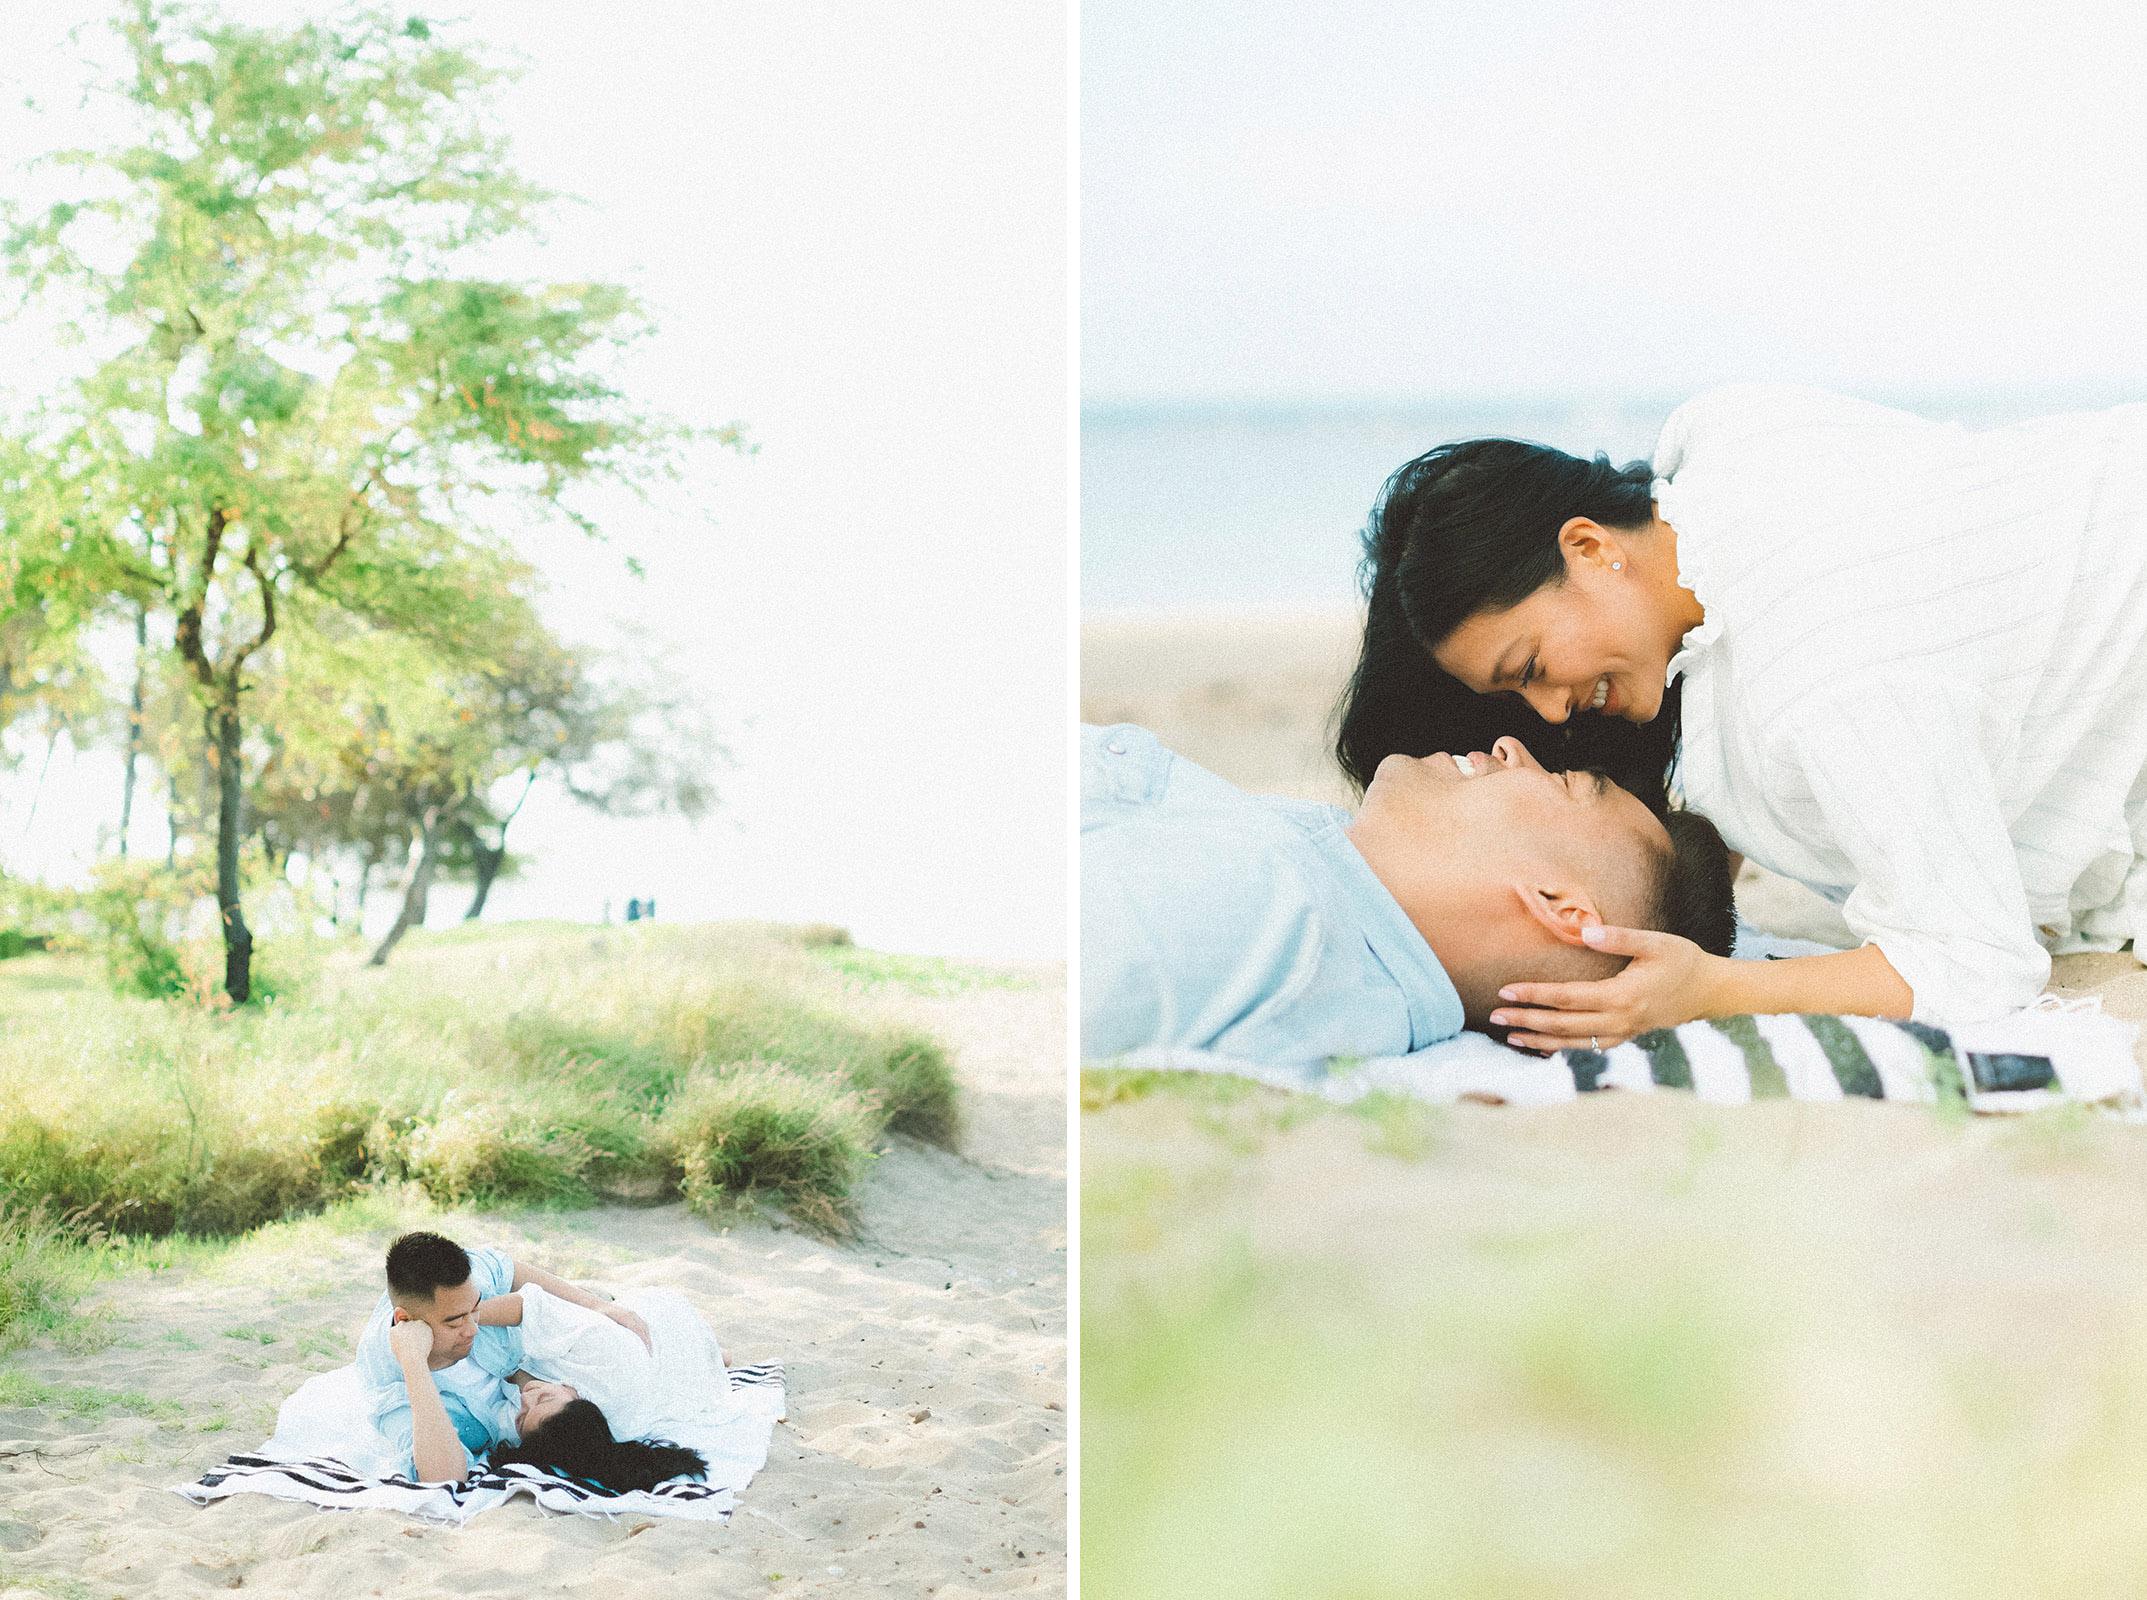 maui beach engagement session389 copy.jpg